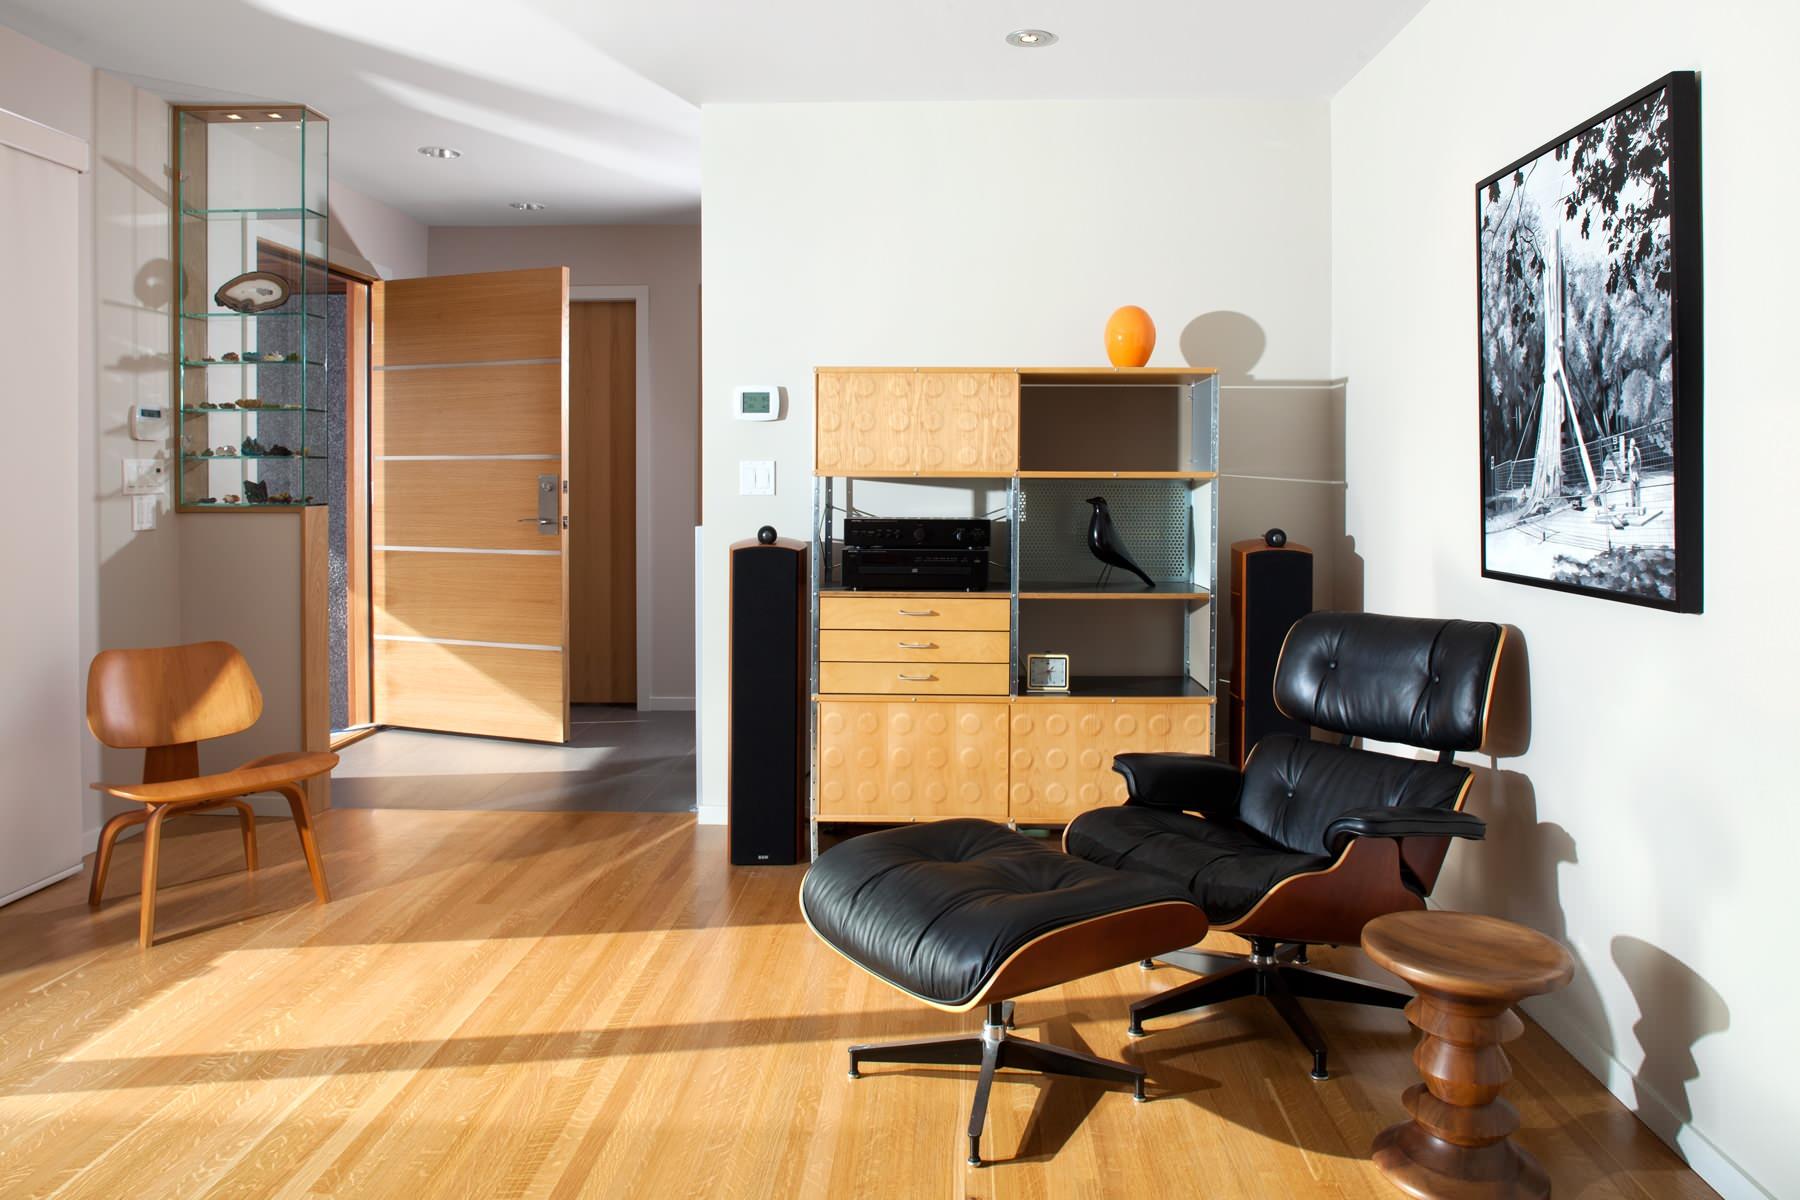 Eames Lounge Chair Ideas Houzz